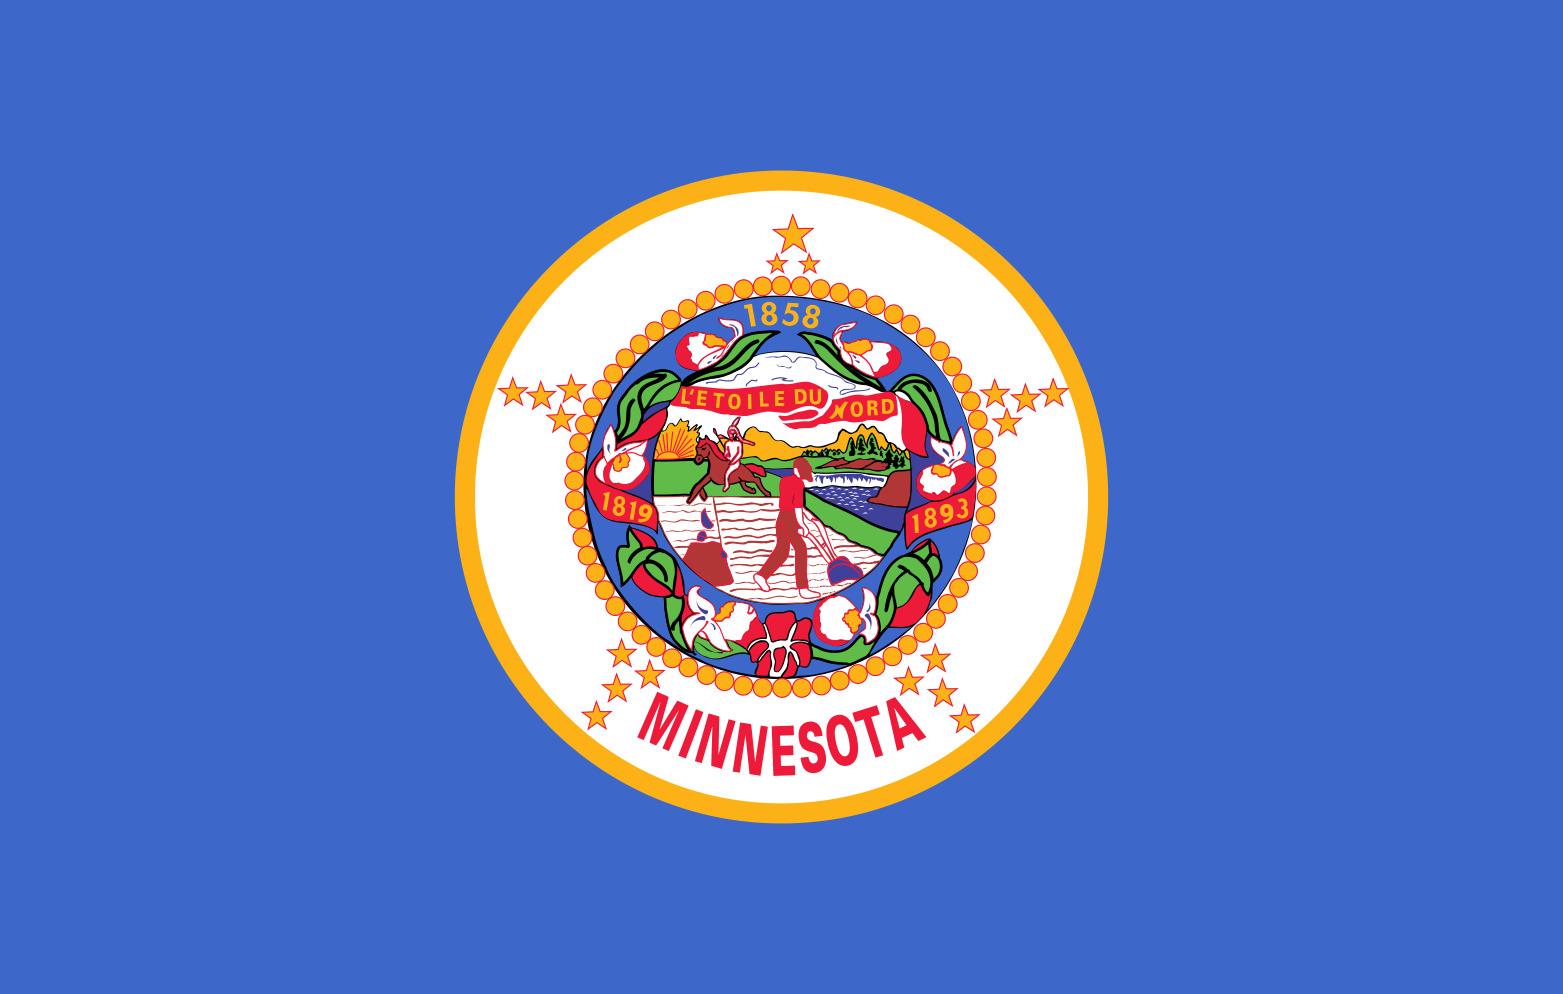 Minnesota State Flag Colors